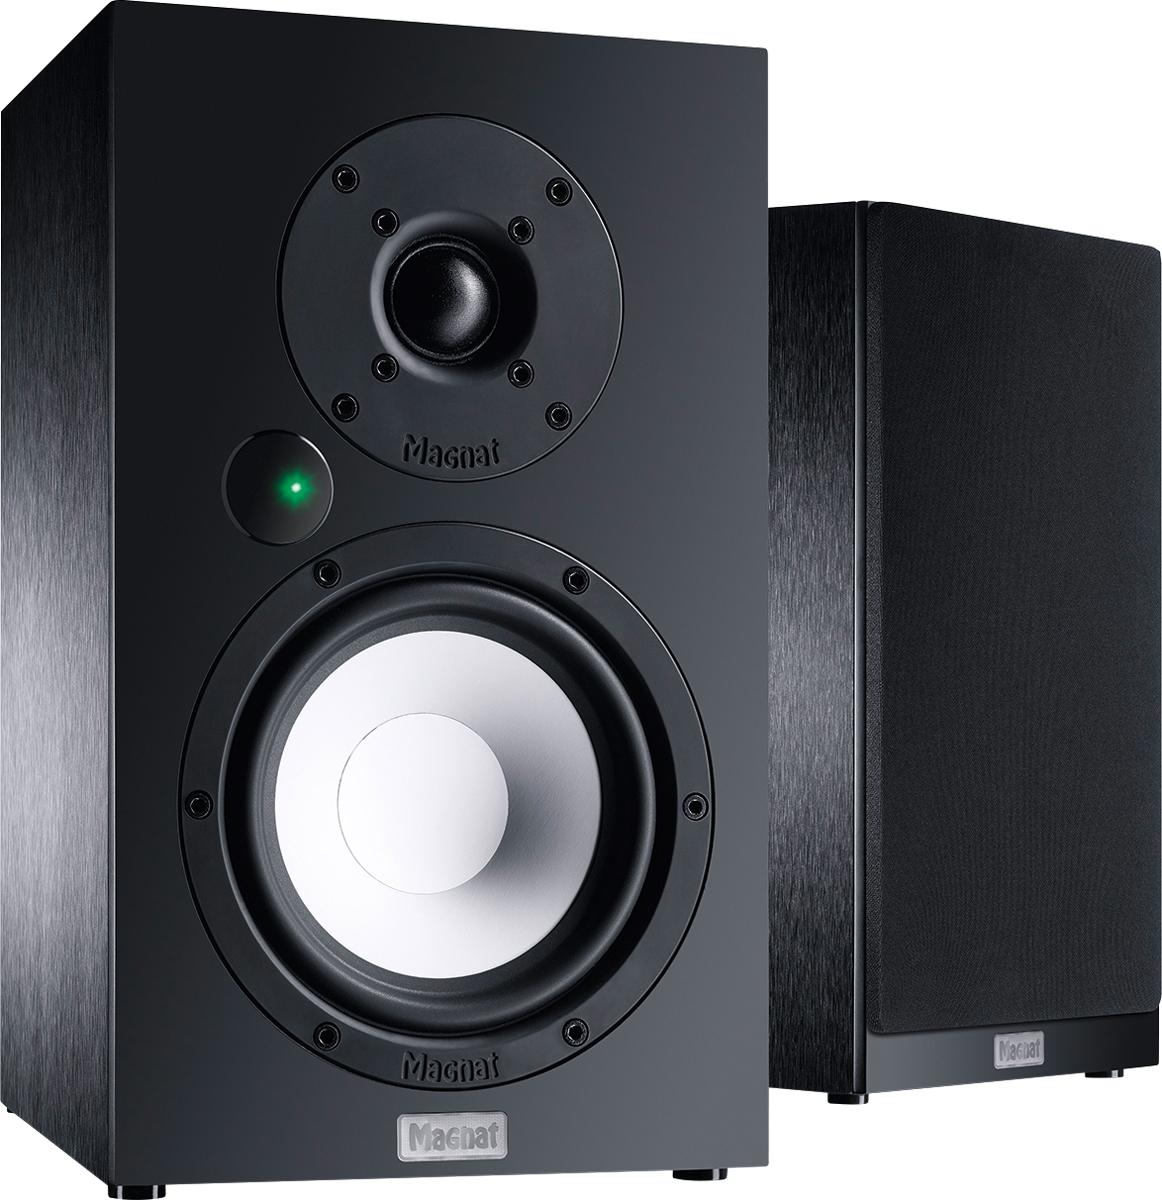 B Ware Magnat Multi Monitor 220, Vollaktives Bluetooth-Stereolautsprecher-Set mit Phonoeingang, 1 Paar 001